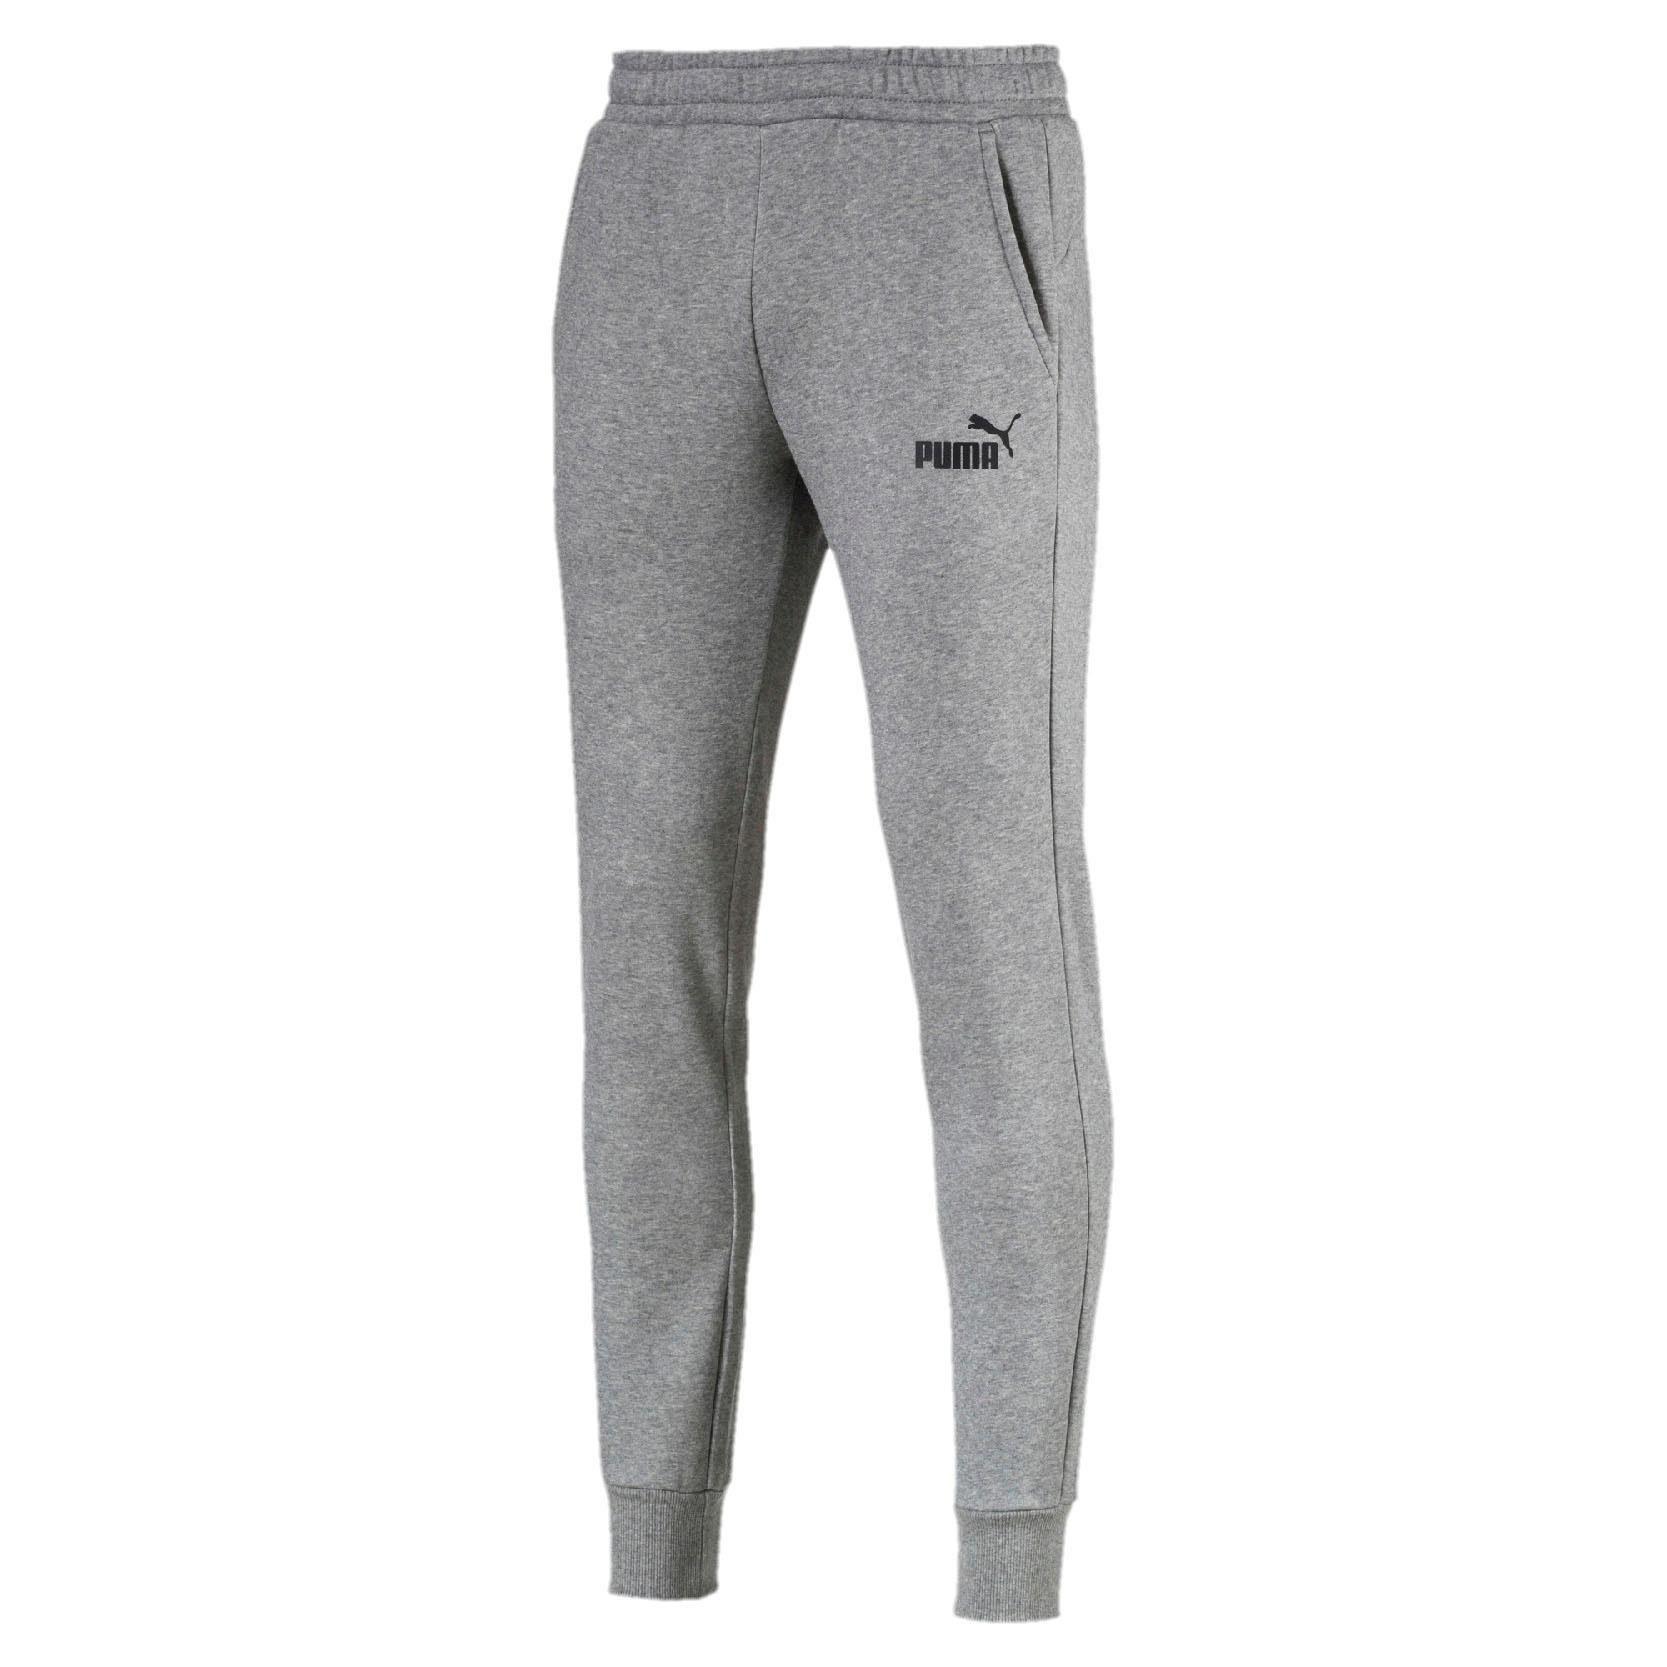 PUMA Jogginghose »ESS LOGO PANTS TR OP«, Logodruck online kaufen | OTTO